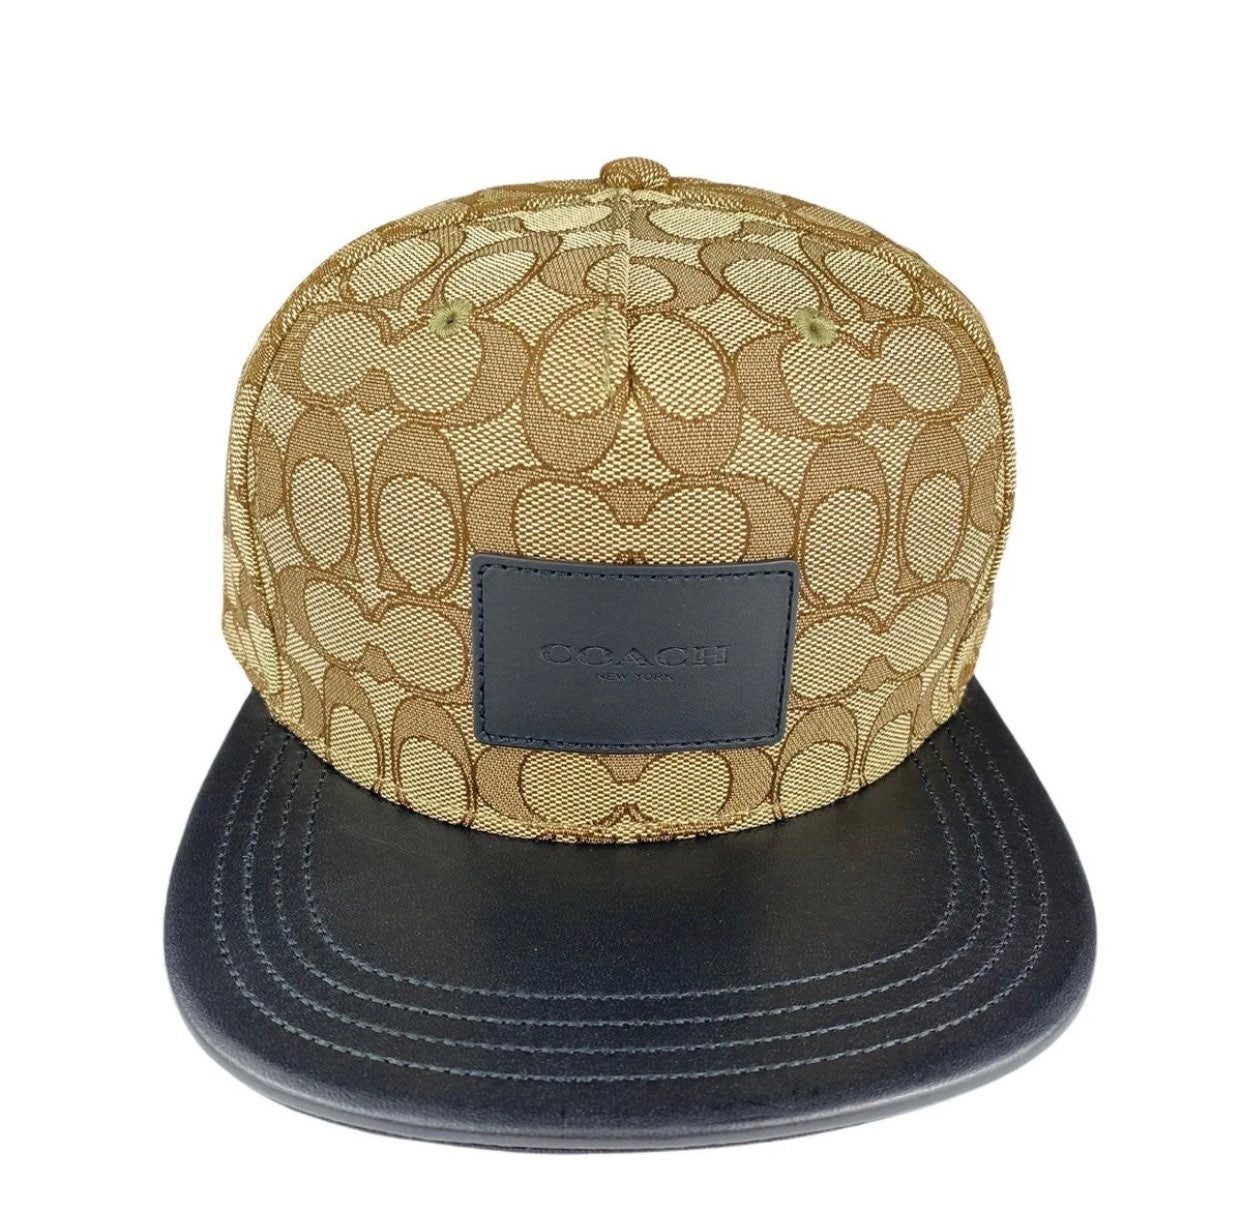 Coach Signature Flat Brim Hat Khaki